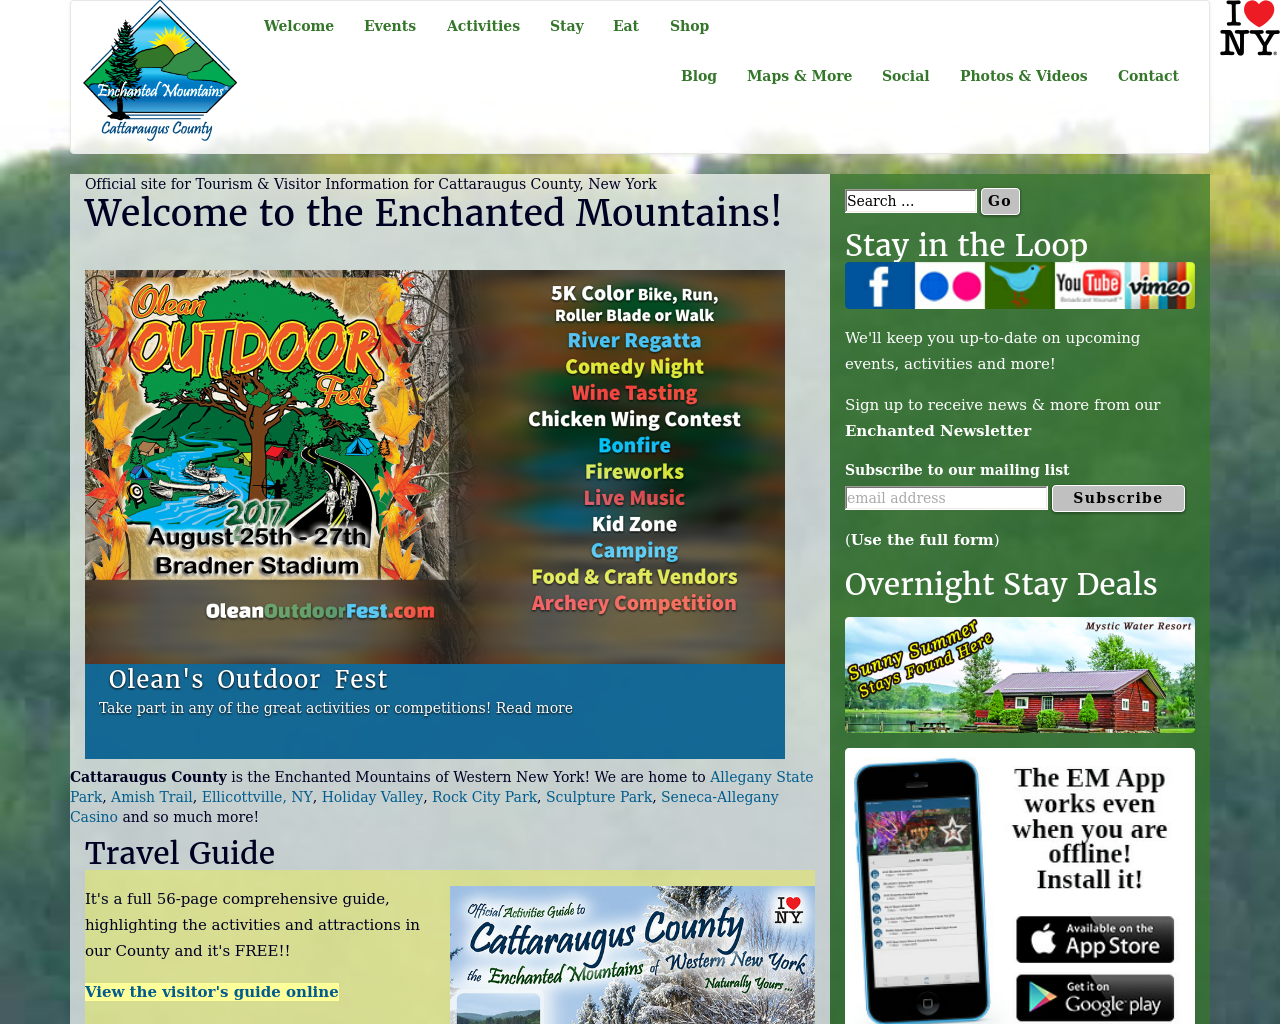 Enchanted-Mountains-Advertising-Reviews-Pricing